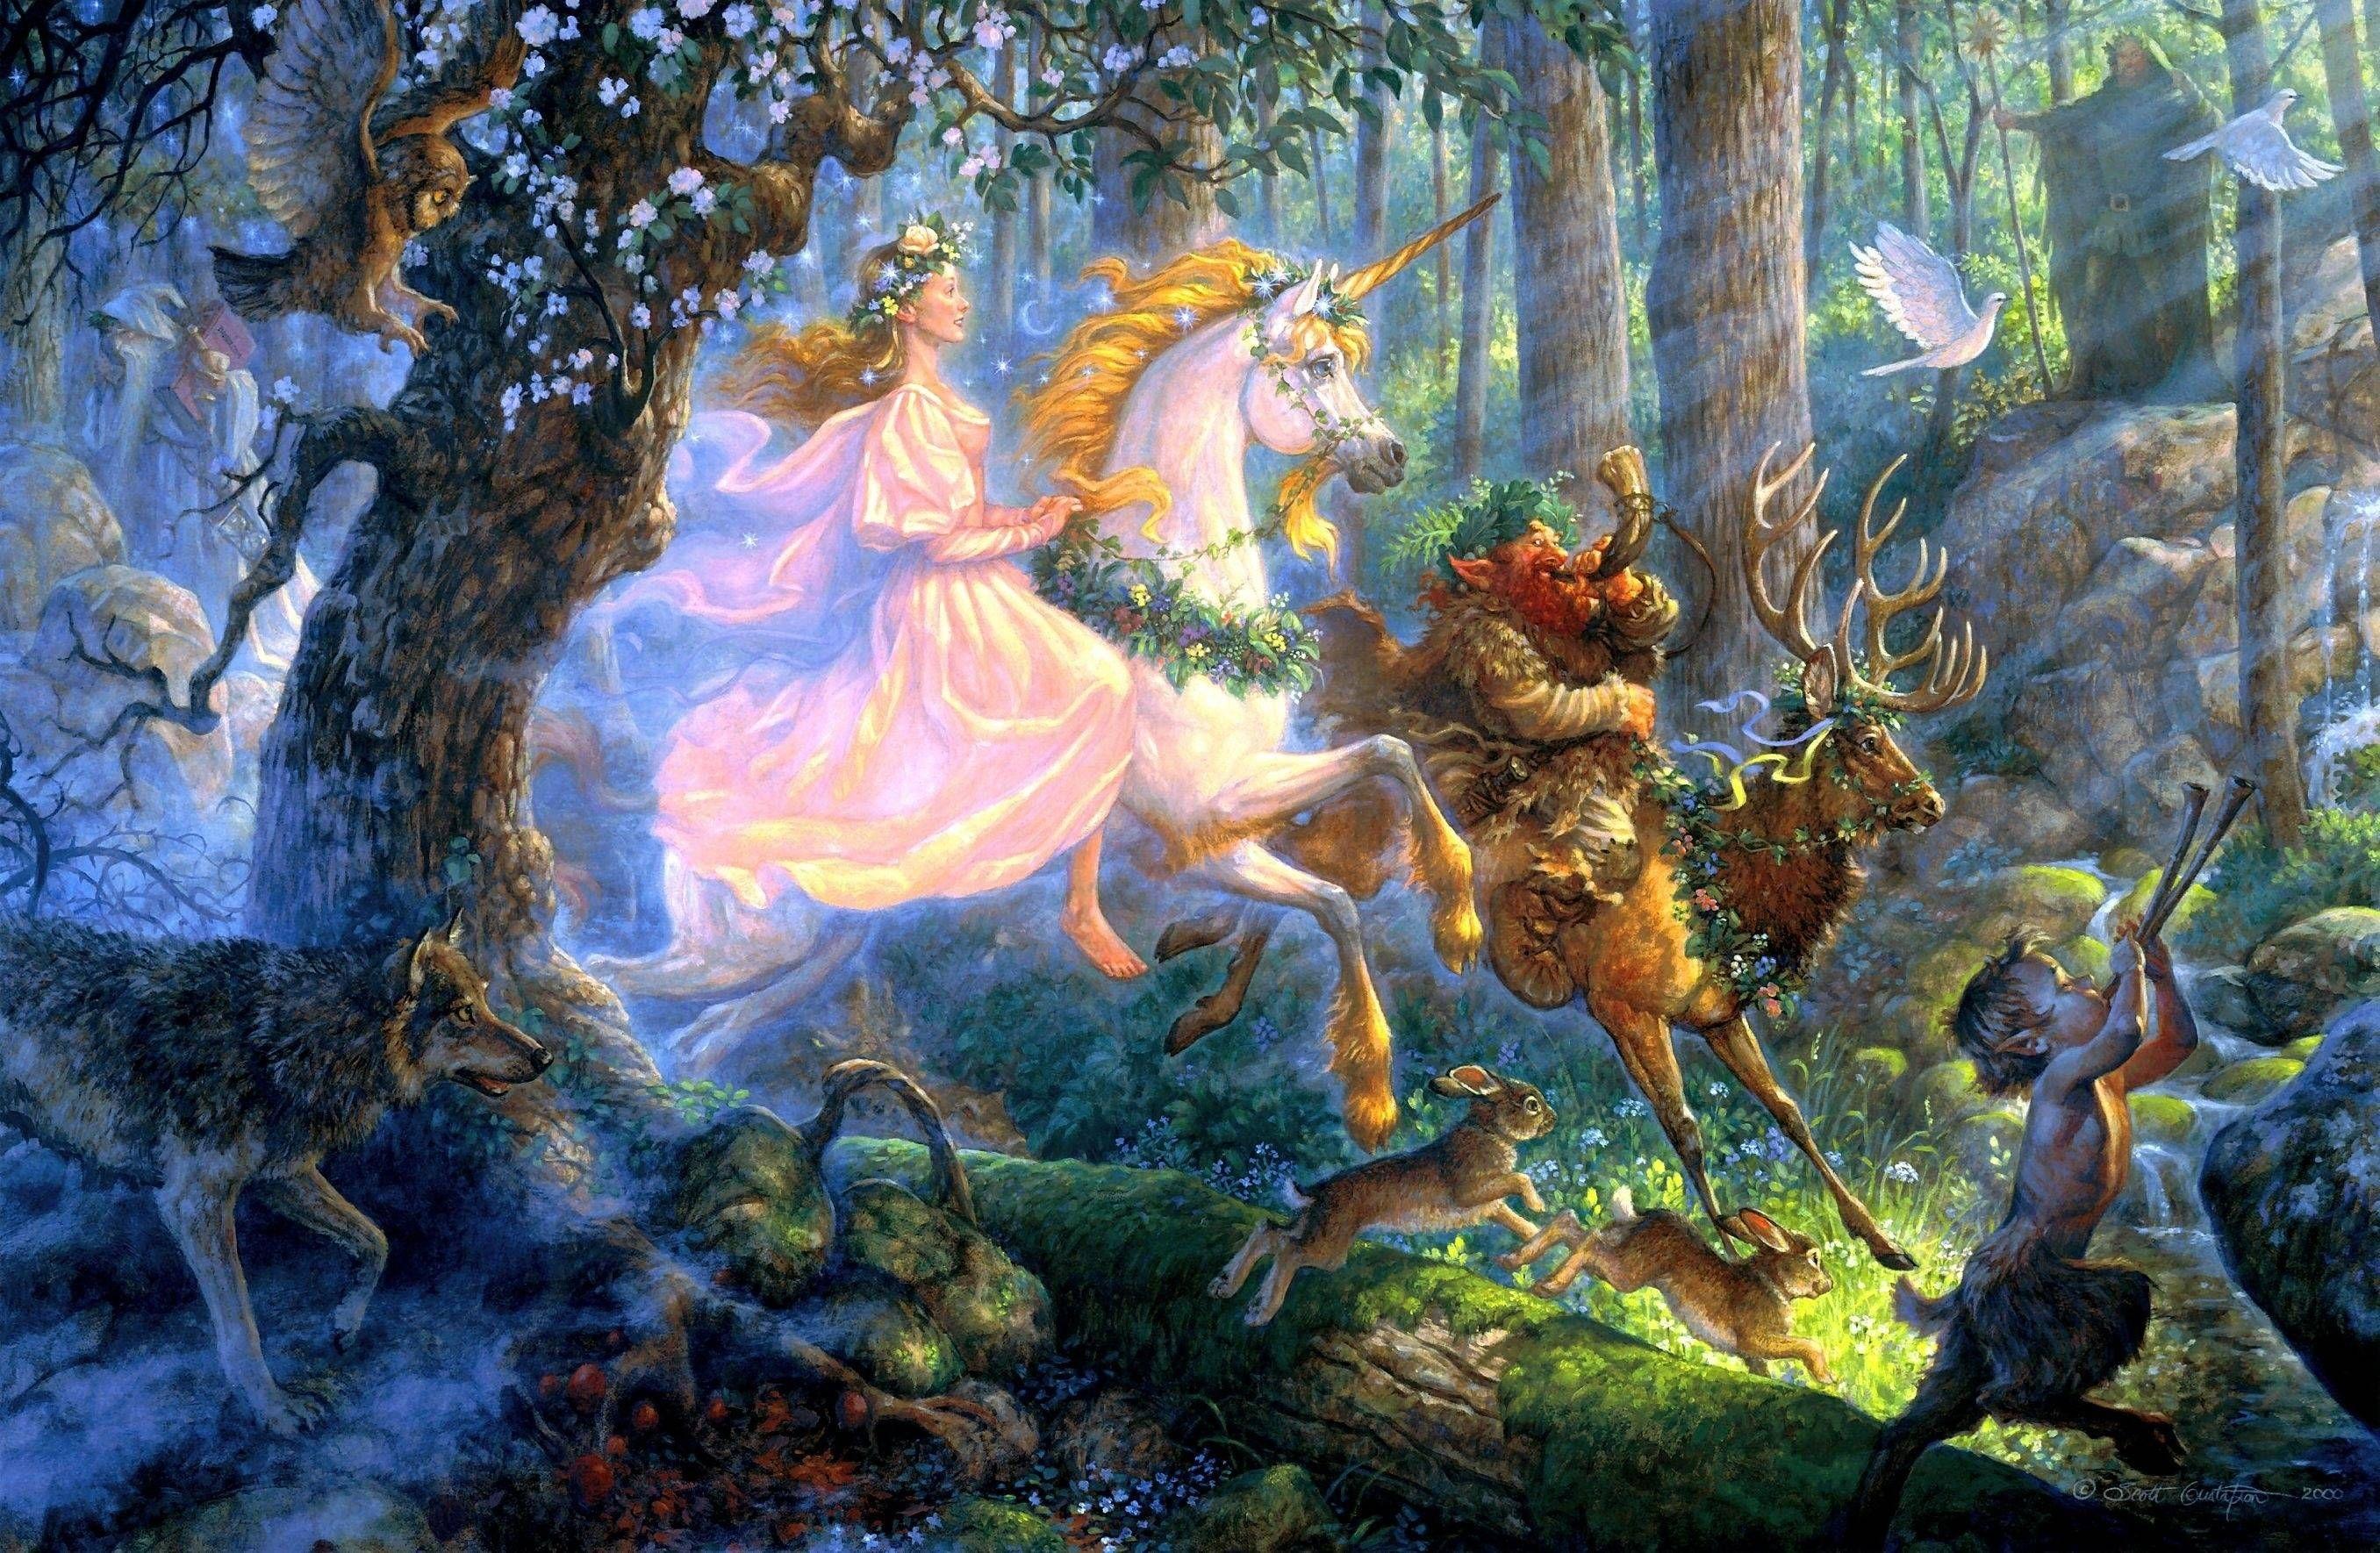 Best Wallpaper Horse Fairy - 9e200f4db10e6f11734397ec216d9d76  HD_363626.jpg